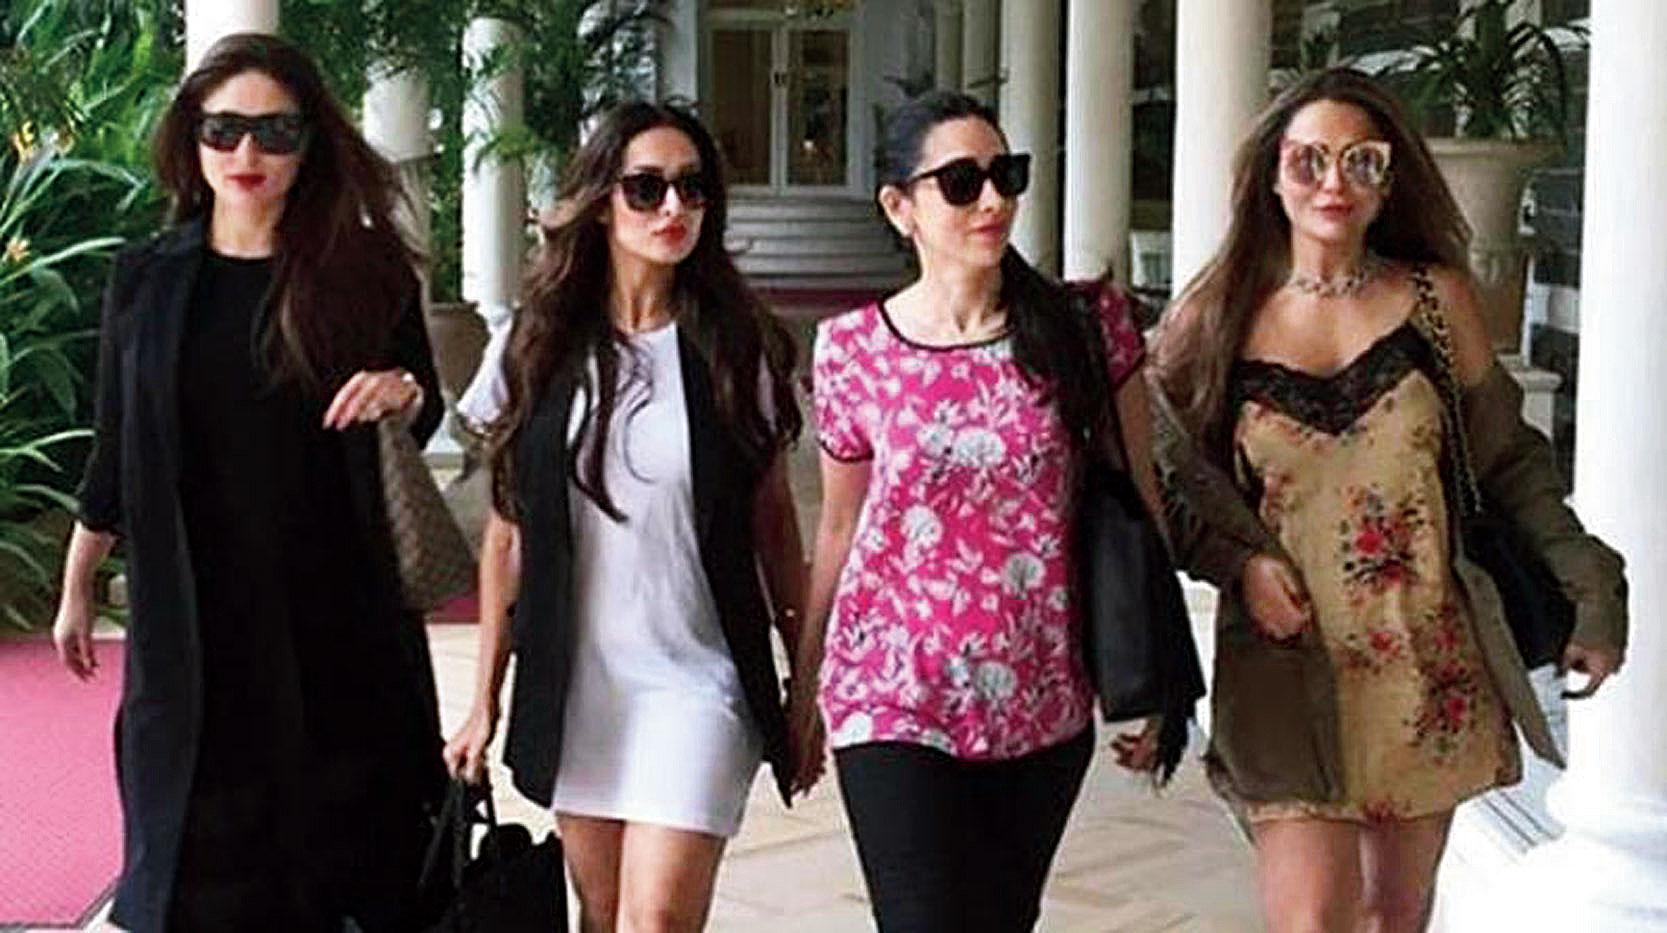 (L-R) Kareena Kapoor Khan, Malaika Arora, Karisma Kapoor and Amrita Arora Ladak